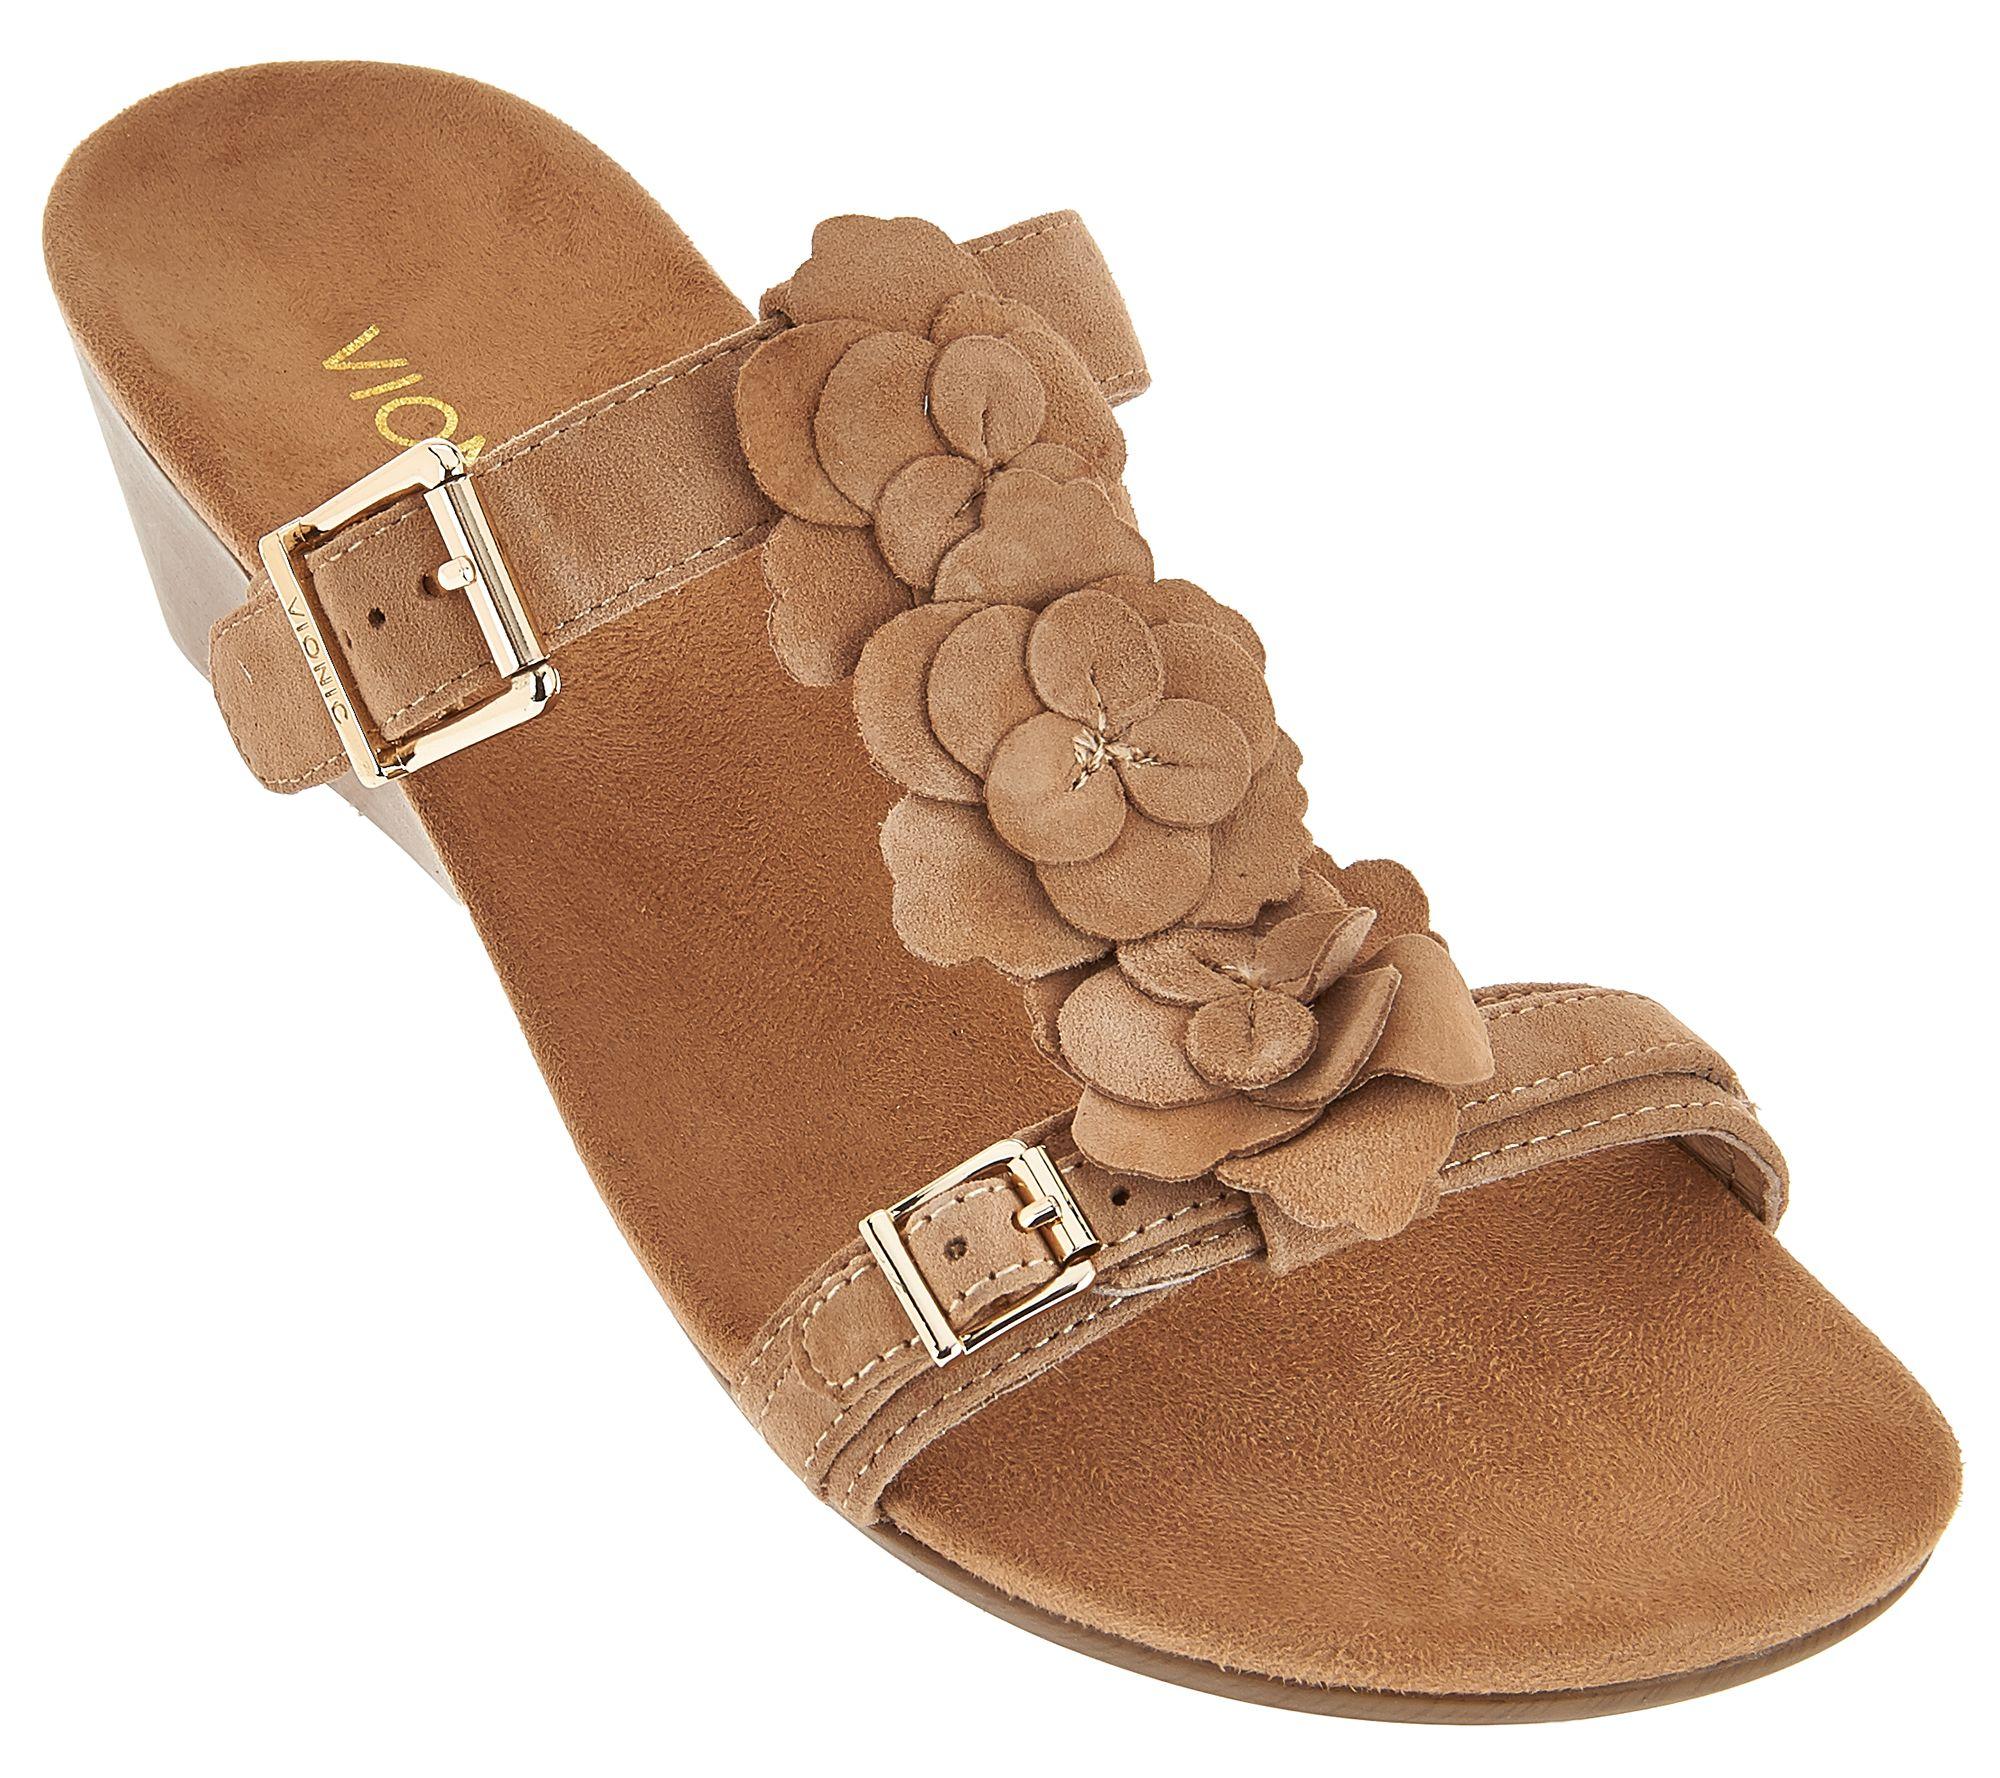 Vionic Shoes On Sale Qvc